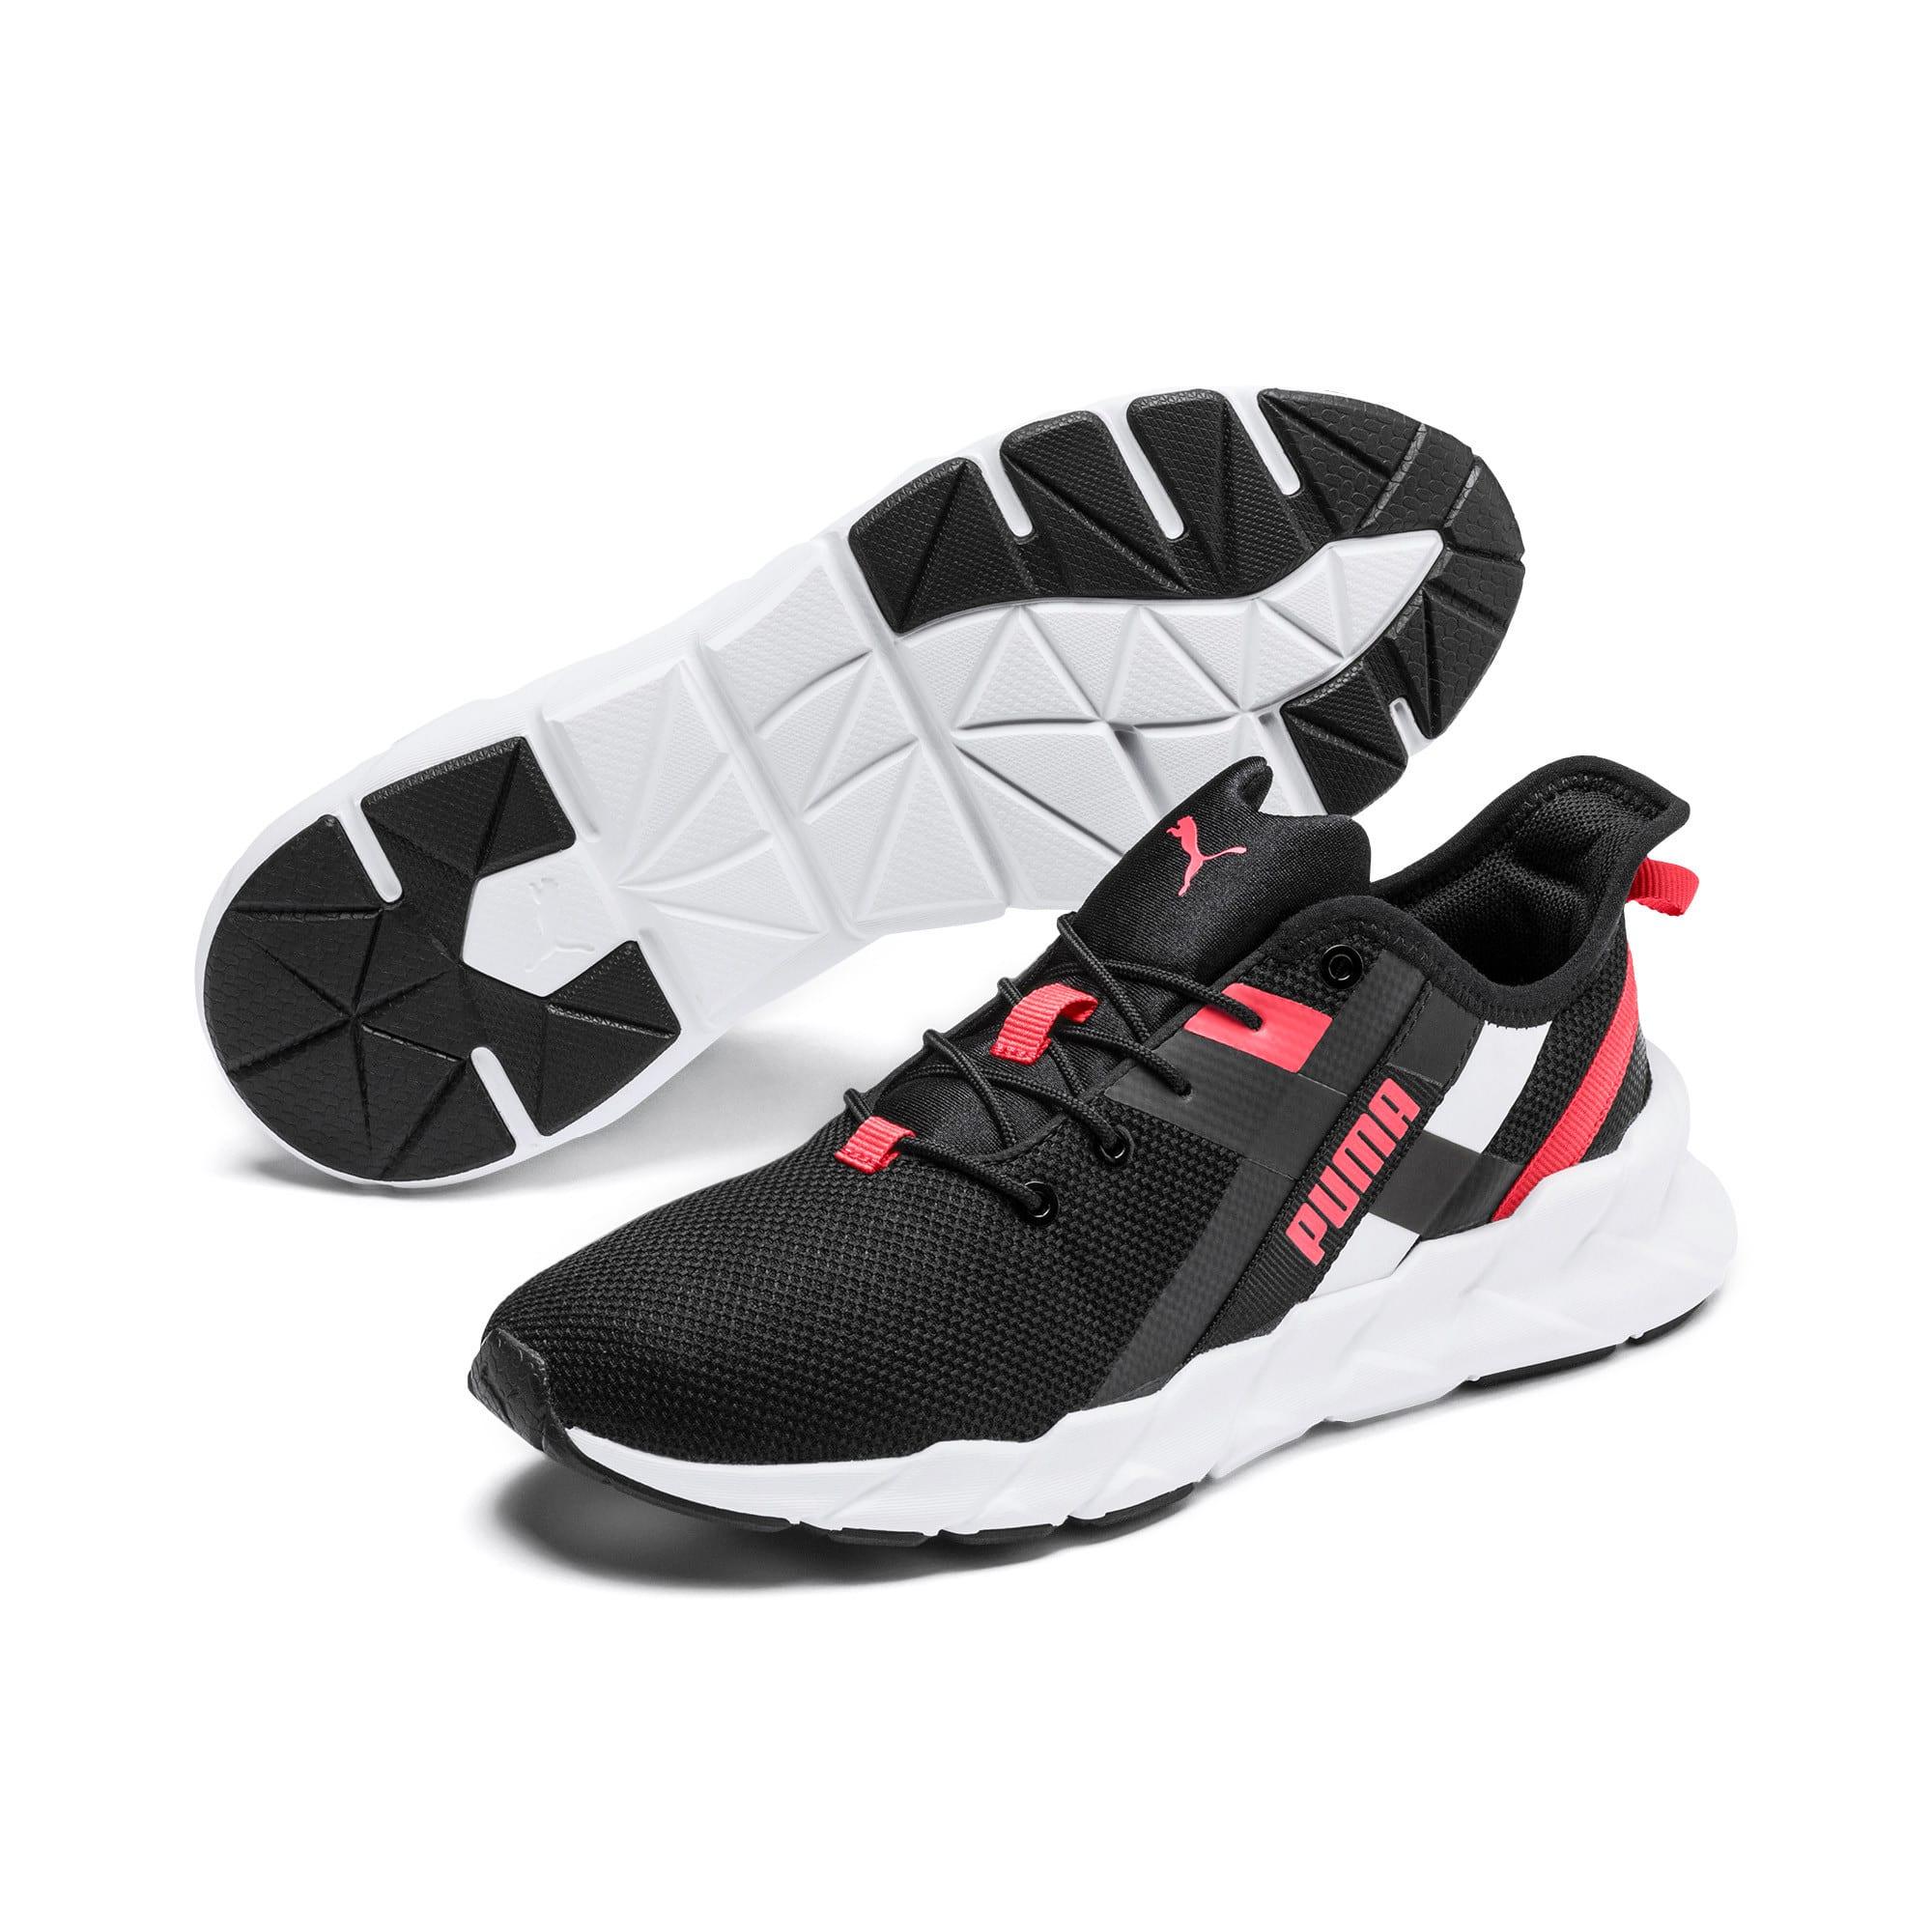 Thumbnail 2 of Weave XT Training Shoes JR, Black-White-Calypso Coral, medium